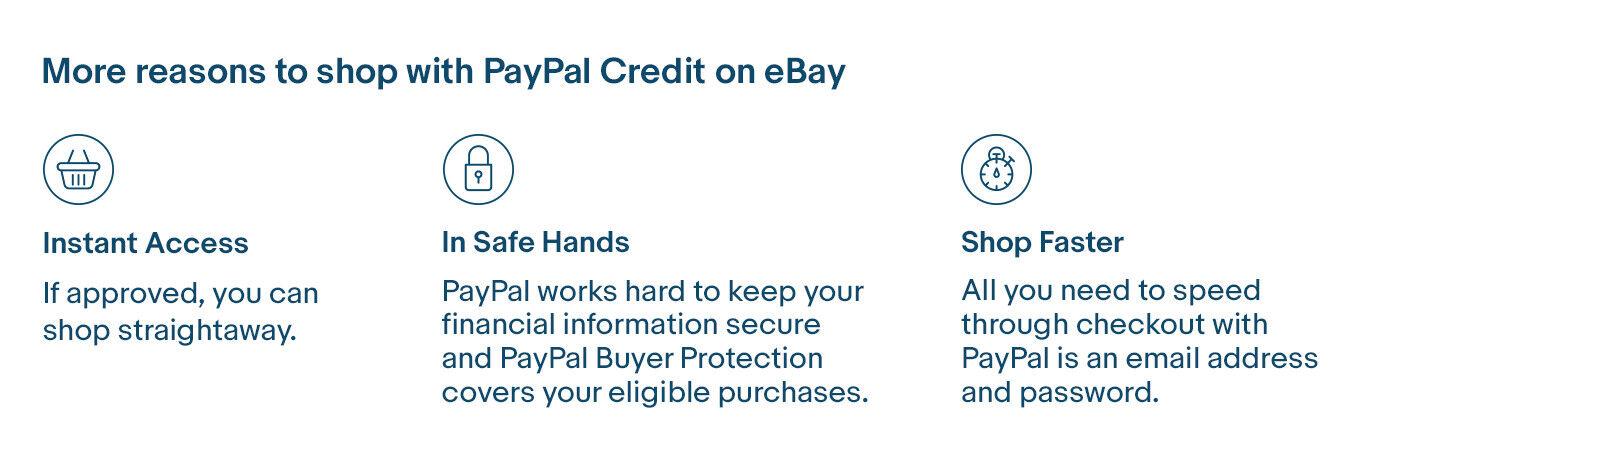 PayPal Credit | eBay